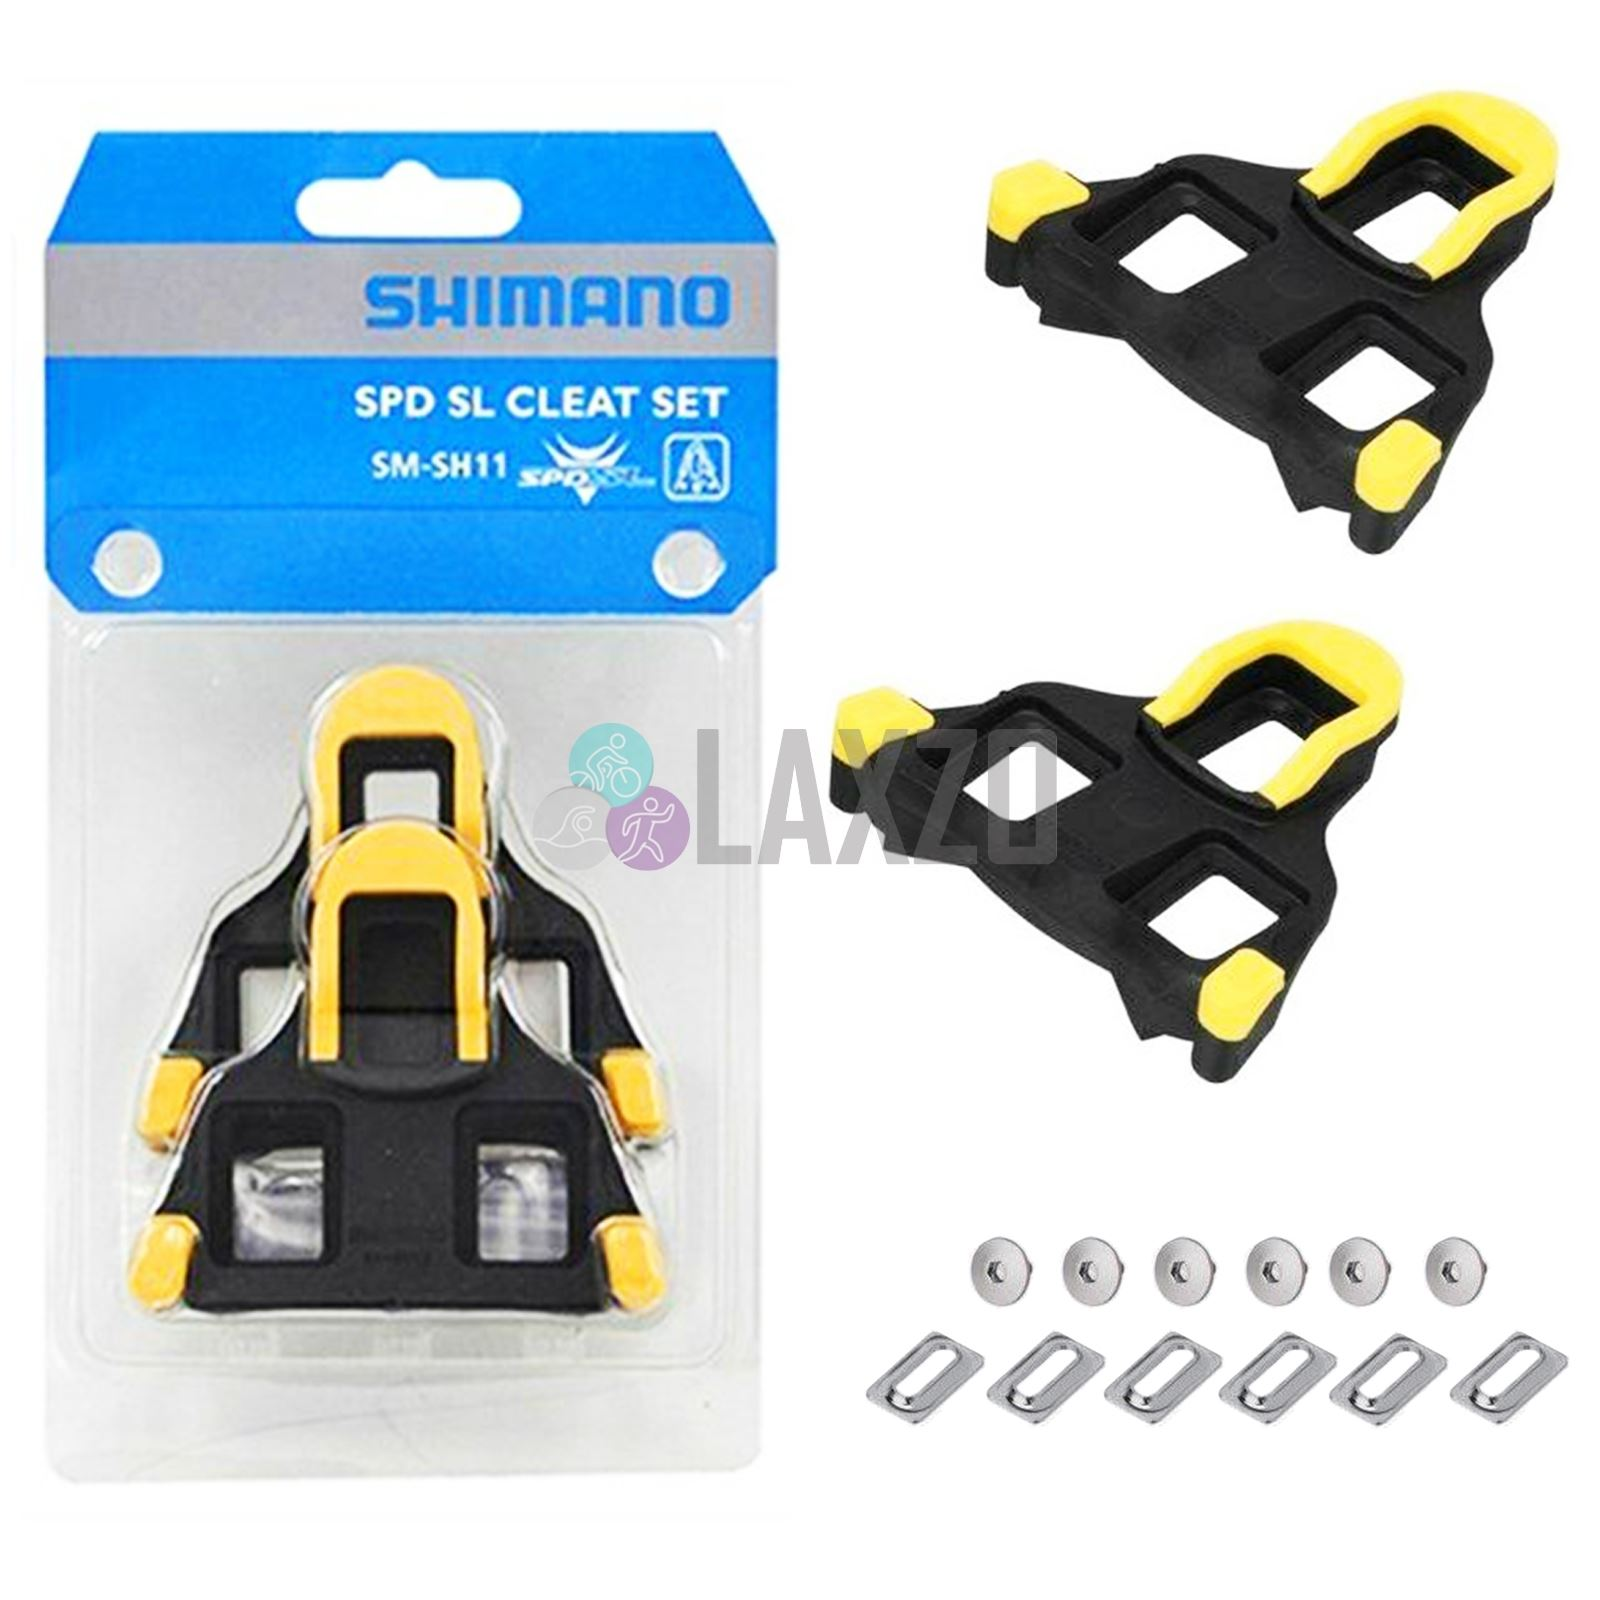 Remplacement Shimano Pédale Crampons Spd Cleat SM-SH51